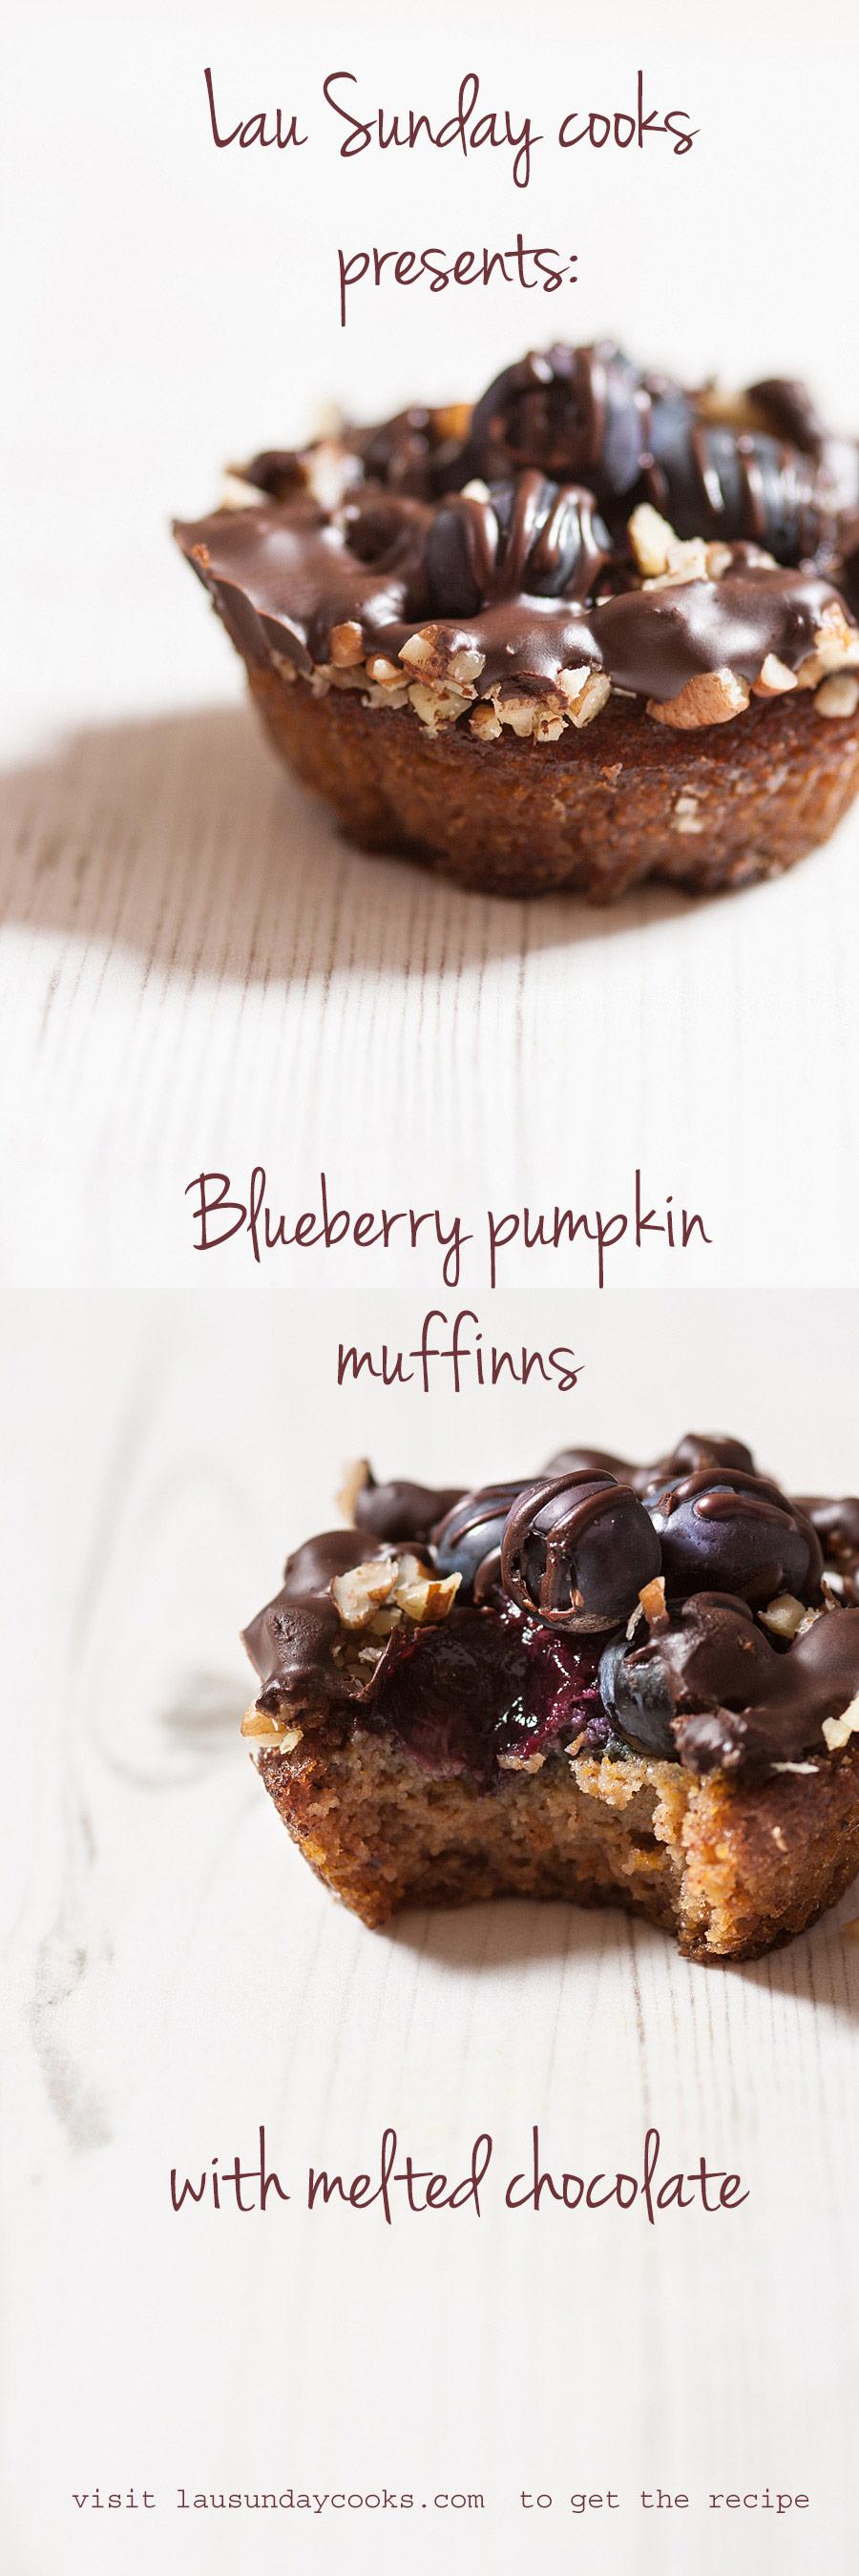 Blueberry pumpkin muffins (Paleo, GF) Pin it | Lau Sunday cooks